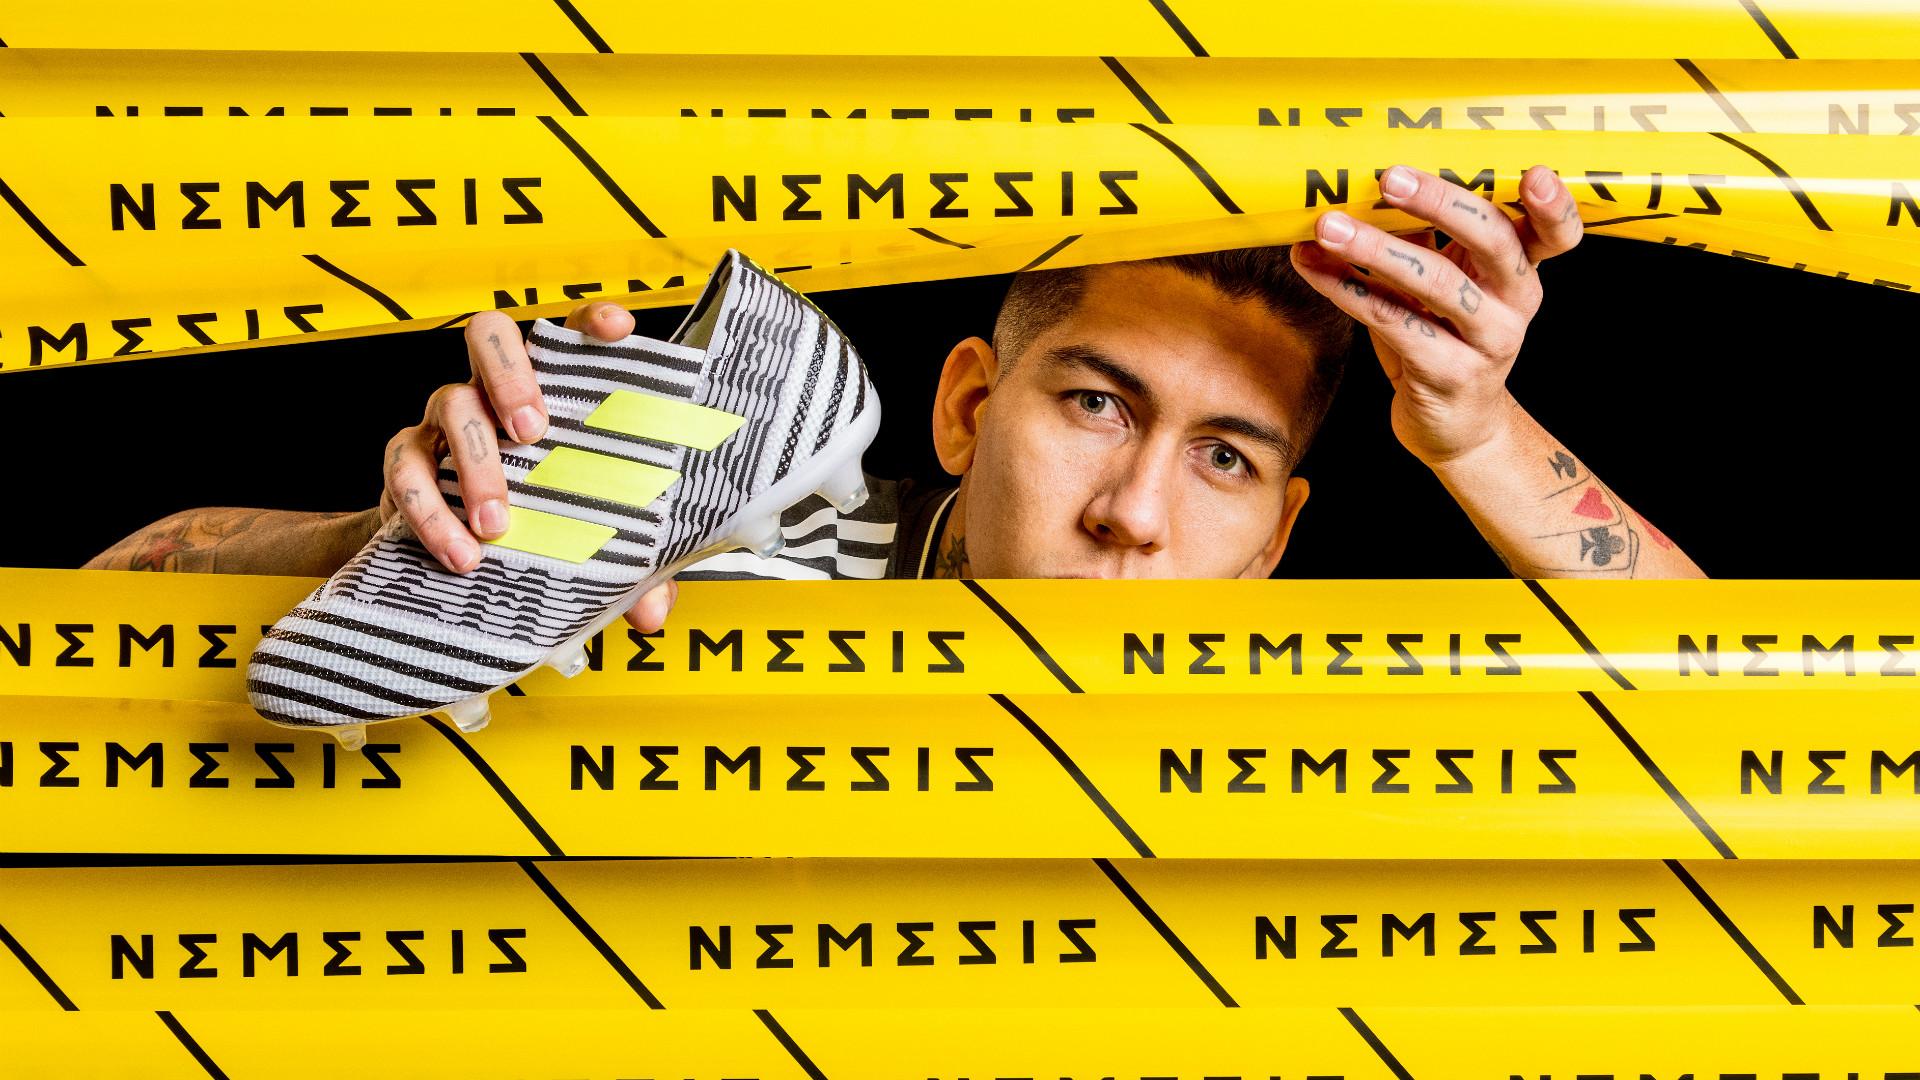 Lionel Messi Wallpaper Adidas